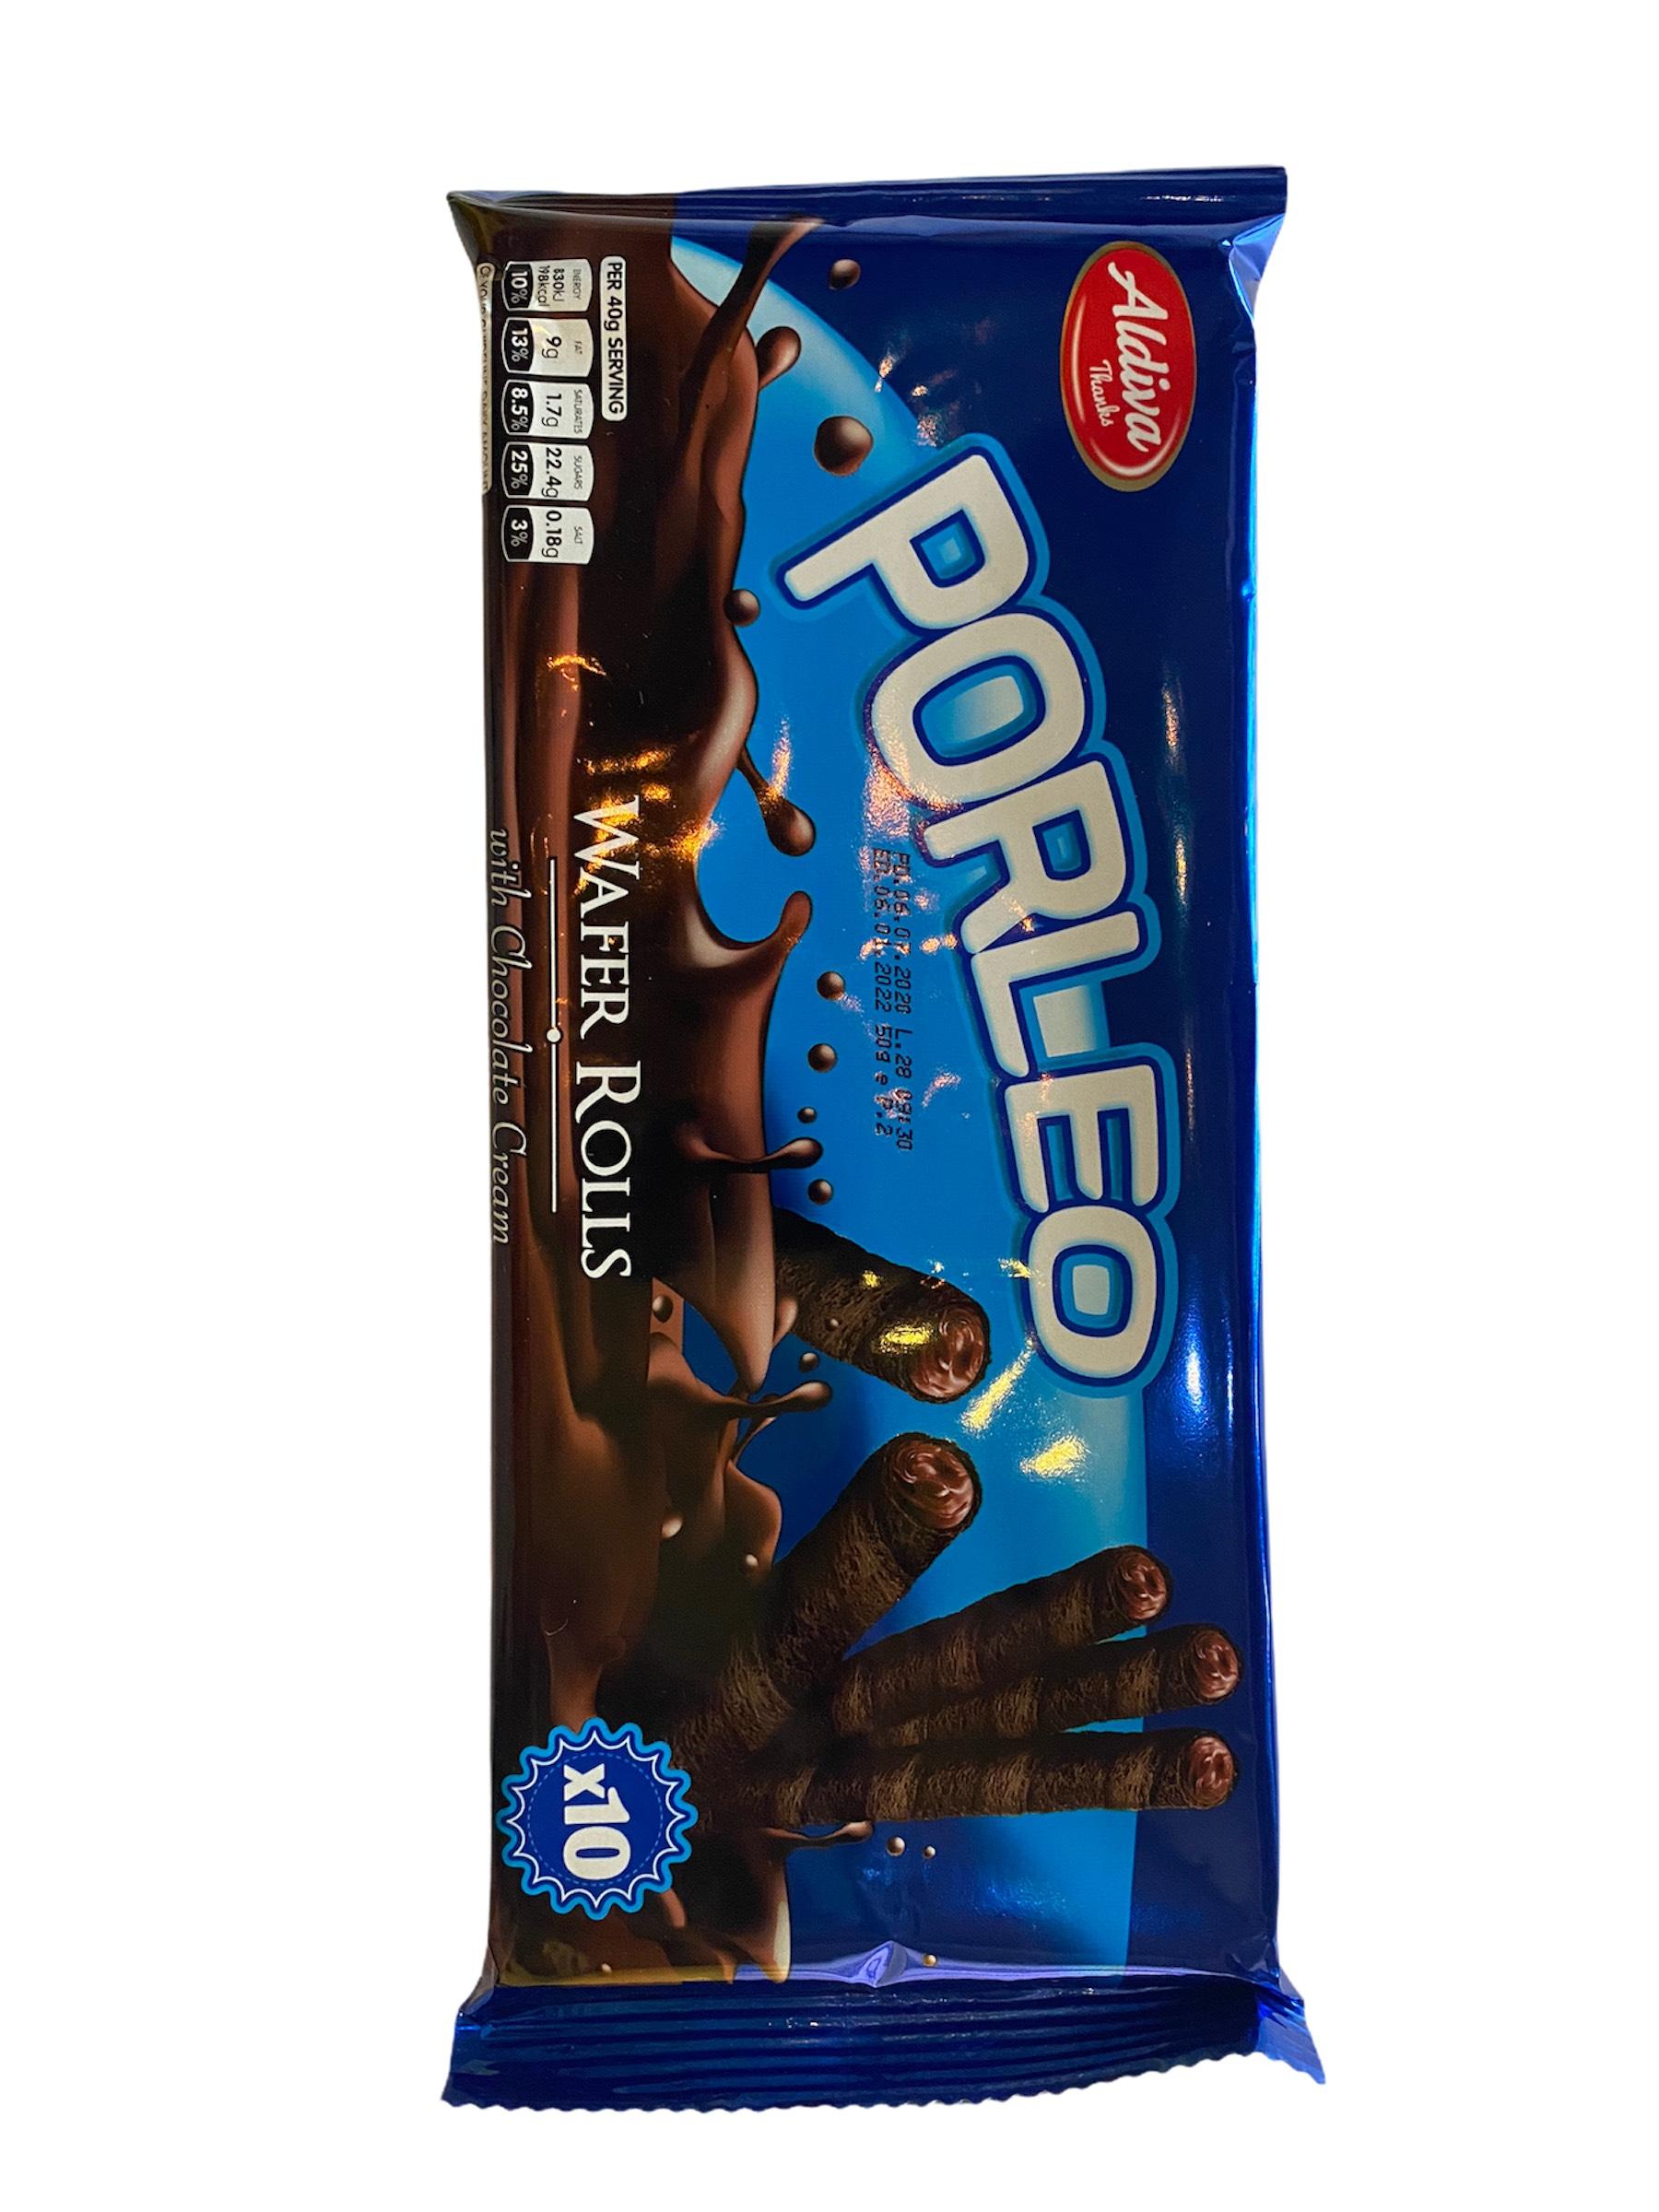 【Aldiva Fiarino】巧克力風味威化蛋捲50g